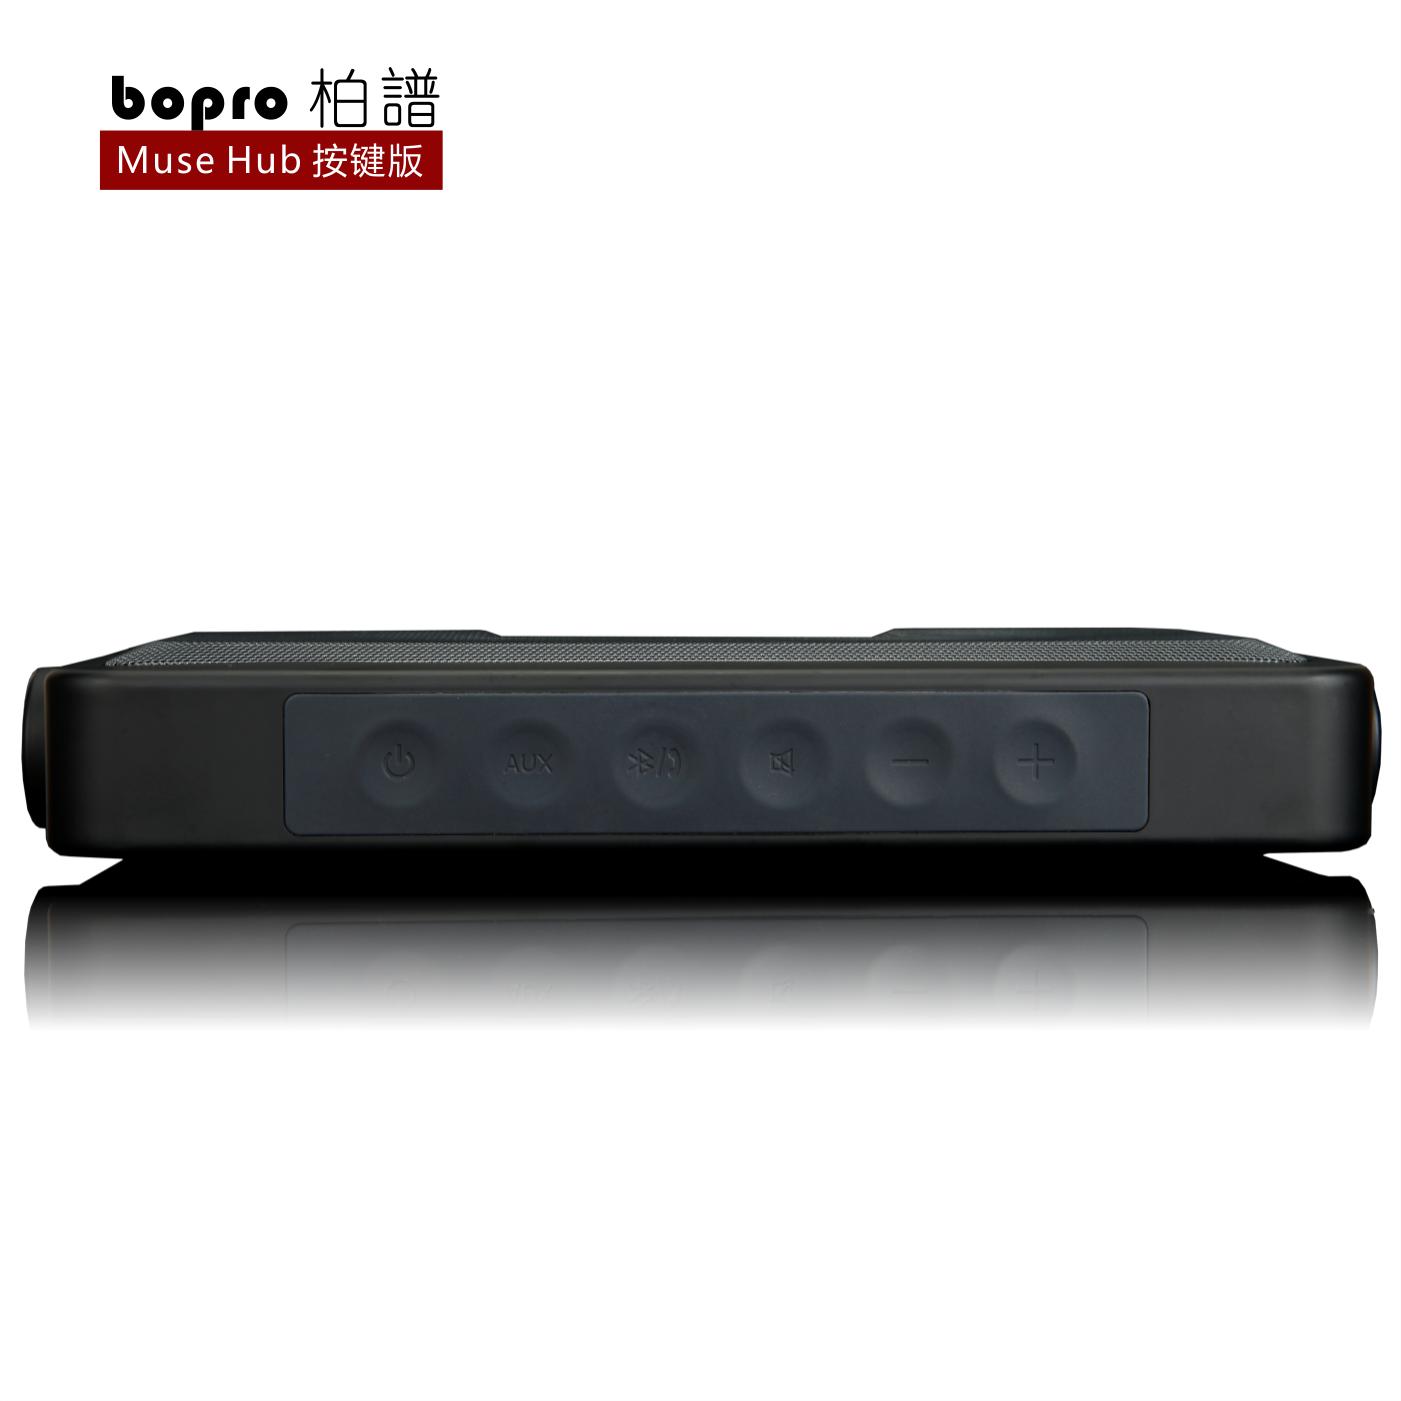 bopro-柏譜 Muse Hub按鍵版魔族music戶外HIFI小音響無線藍牙音箱